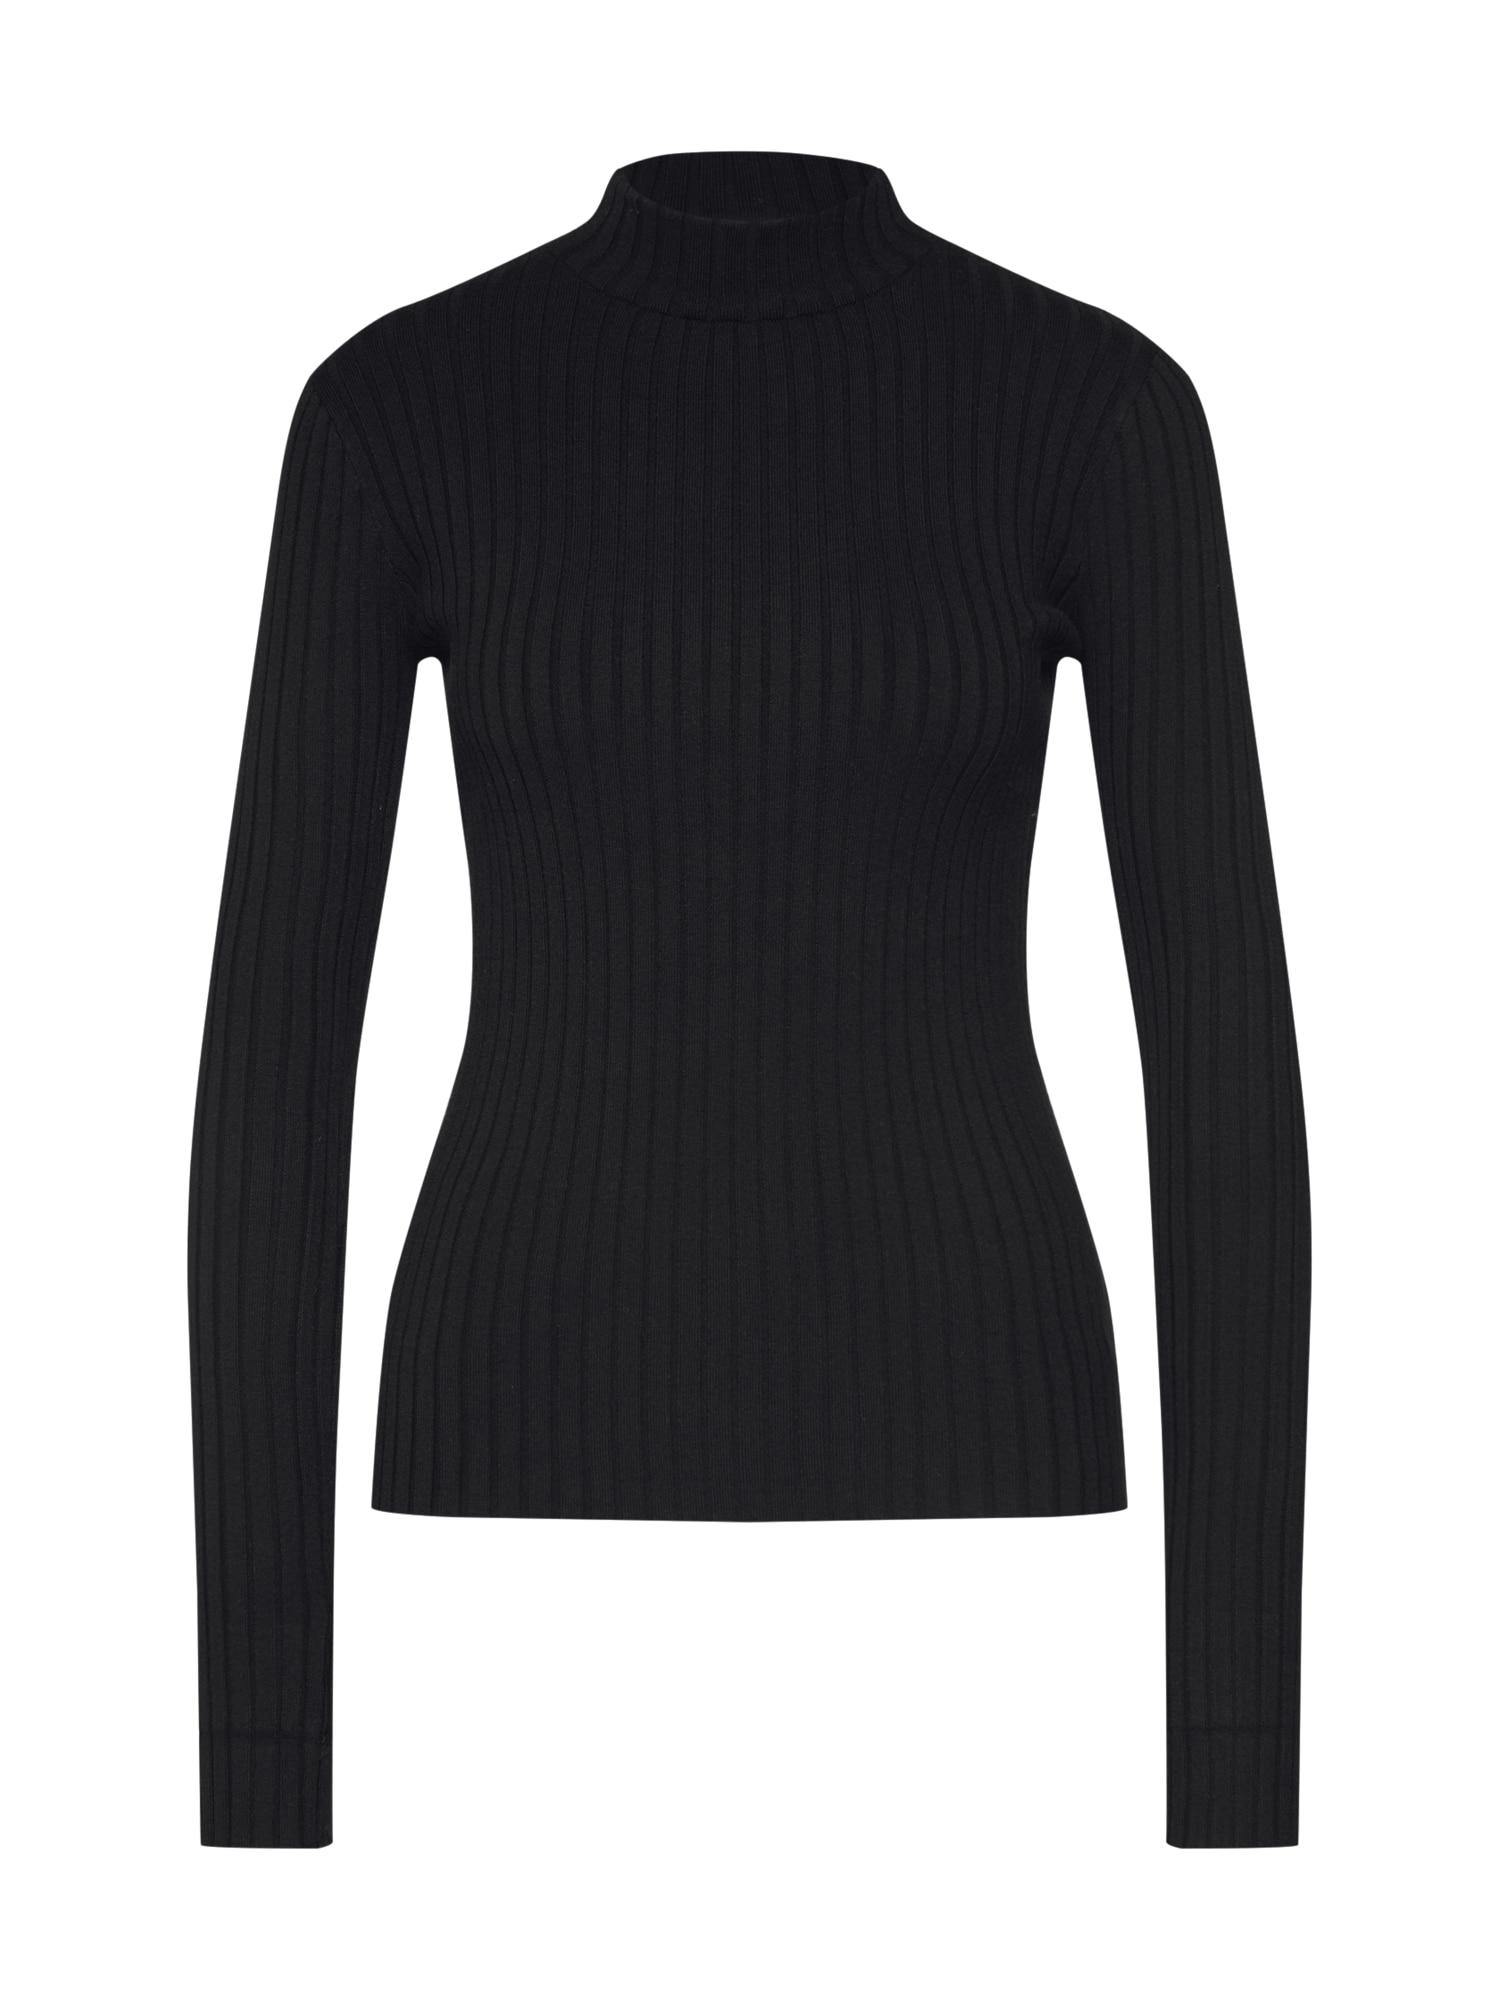 EDITED Megztinis 'Jannice' juoda